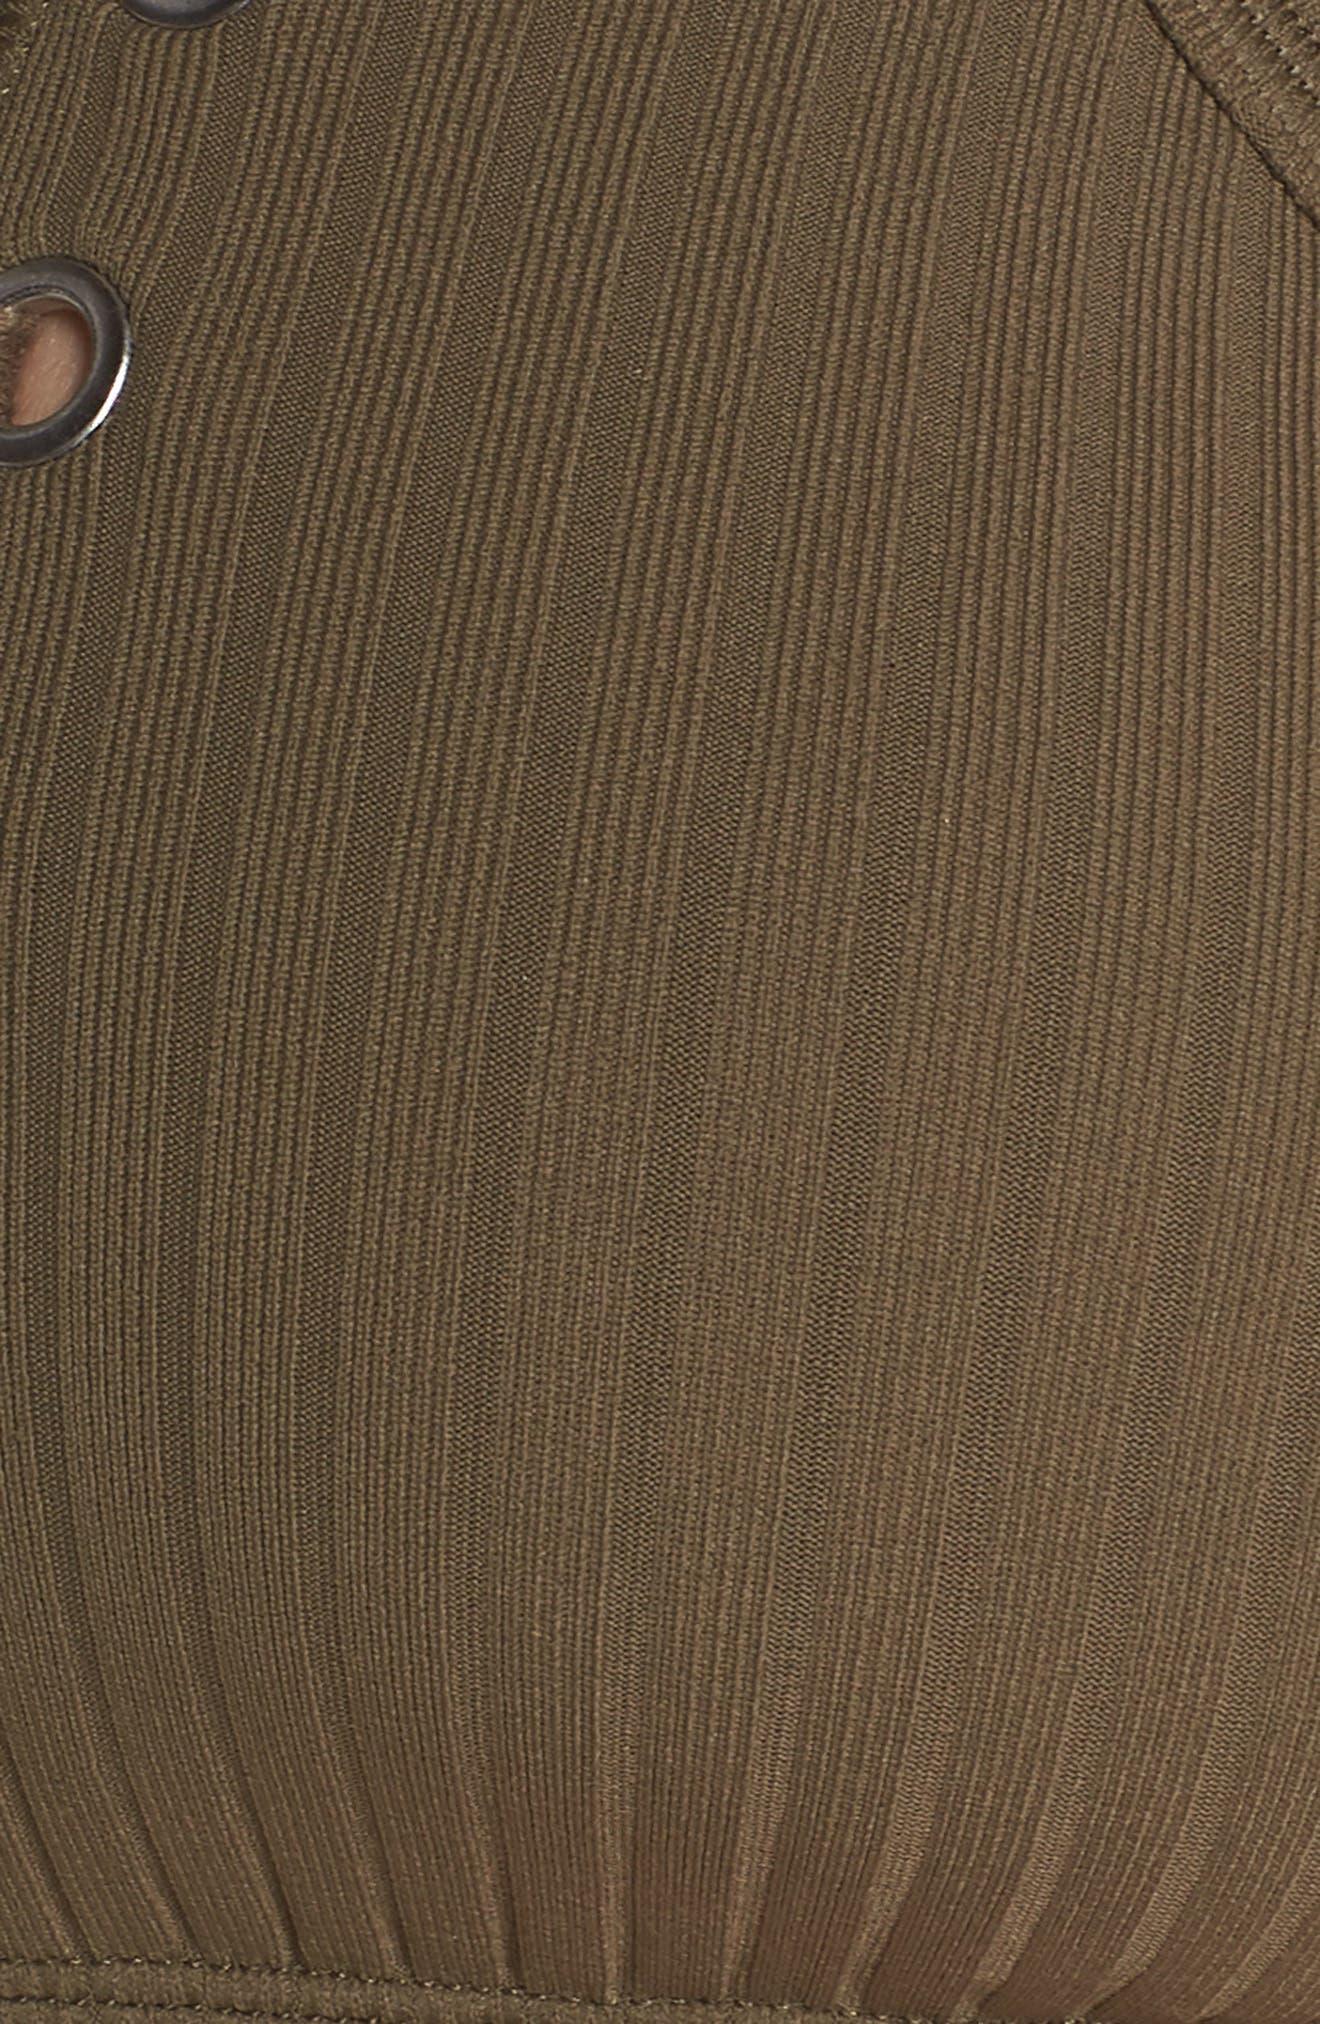 Inka Ribbed Lace-Up Bikini Top,                             Alternate thumbnail 8, color,                             Dark Olive